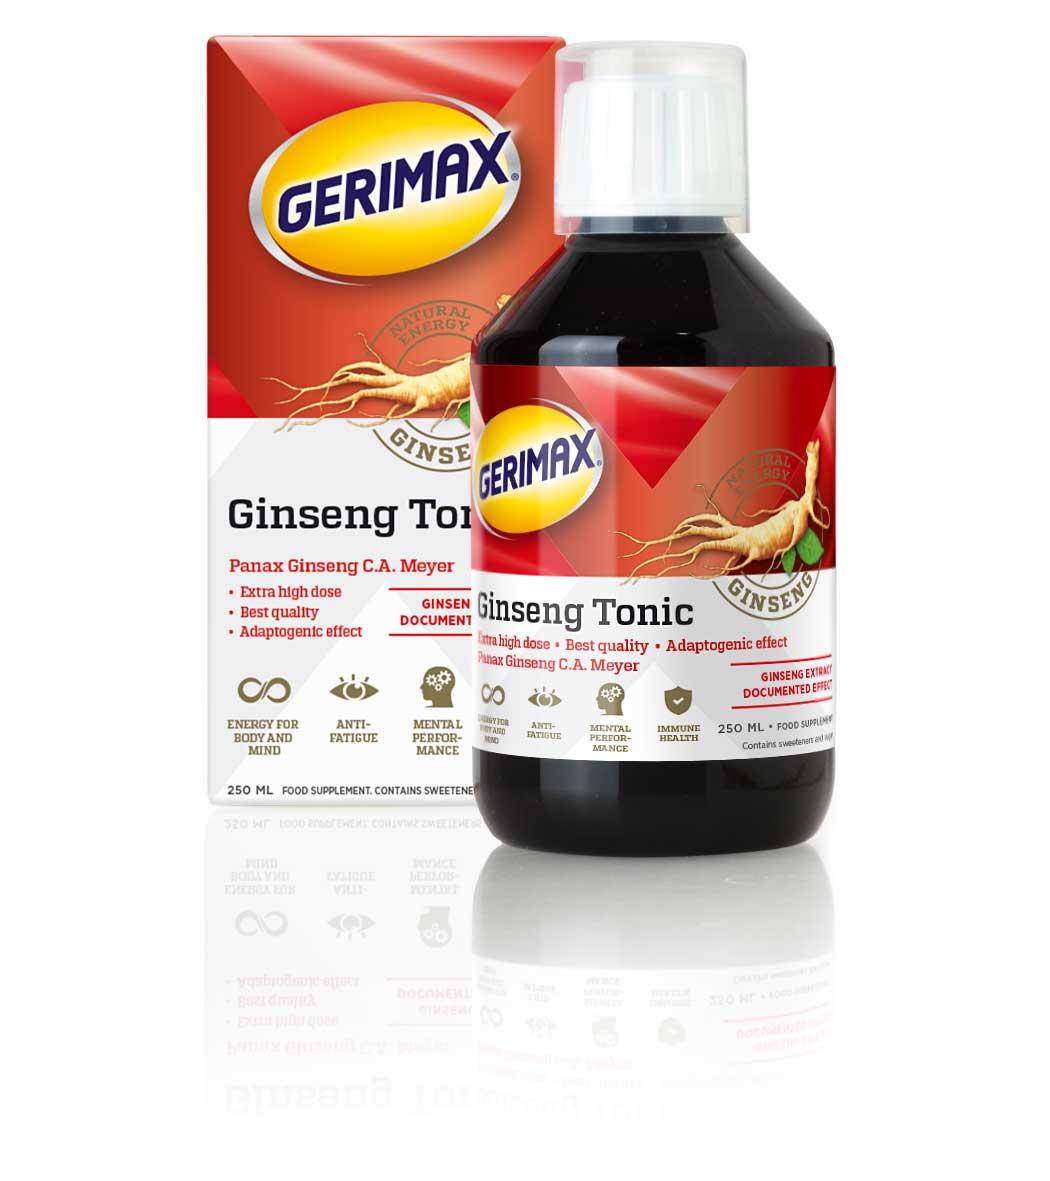 Gerimax Tonic